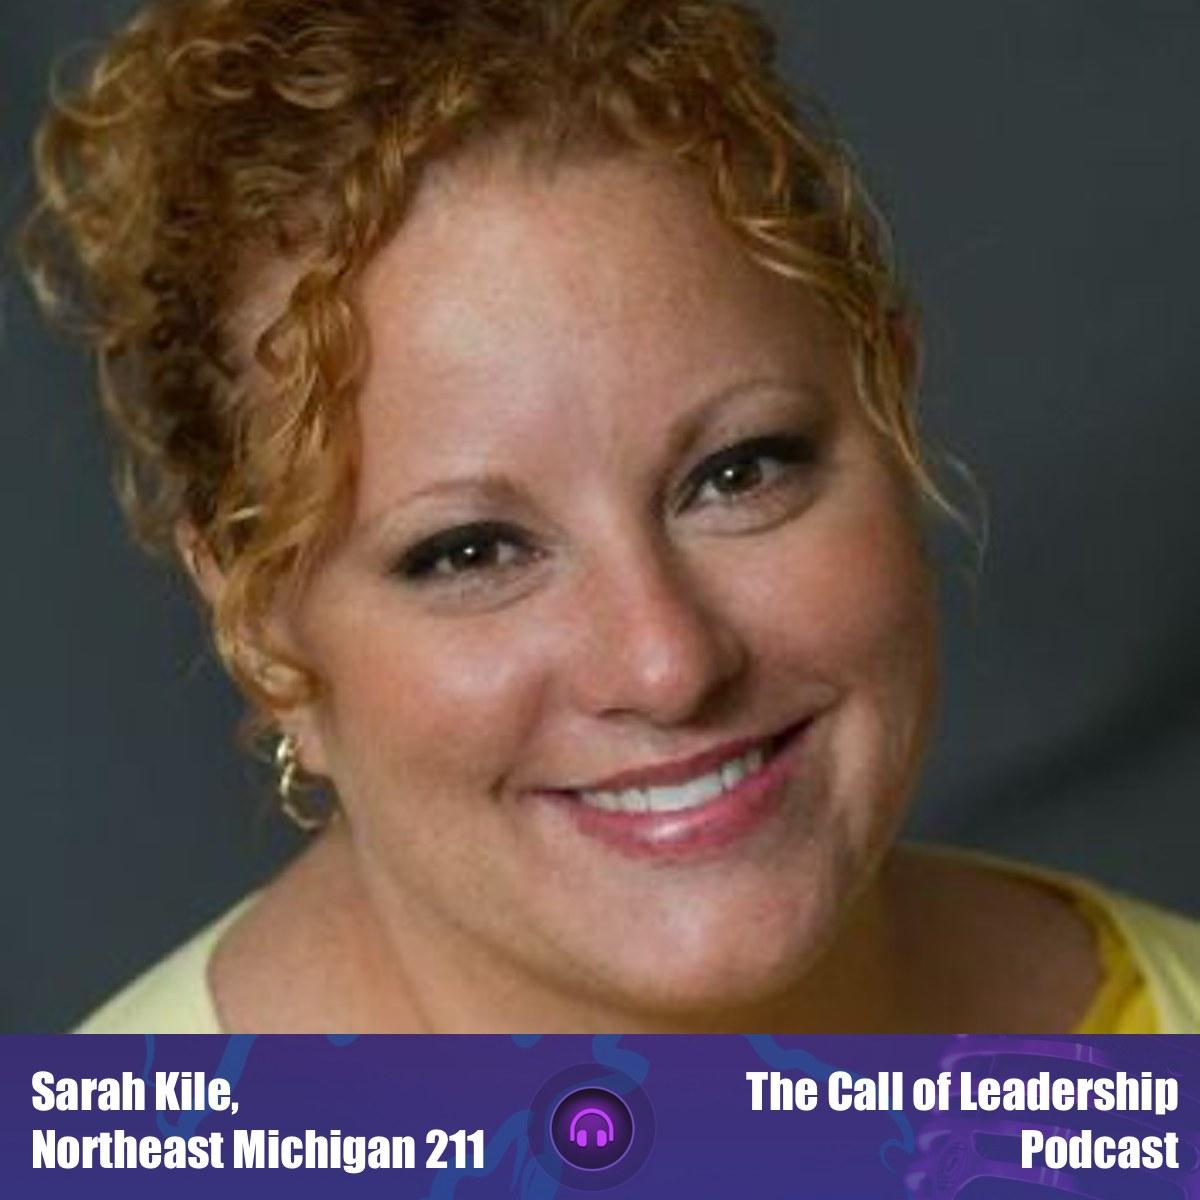 Sarah Kile - Northeast Michigan 211